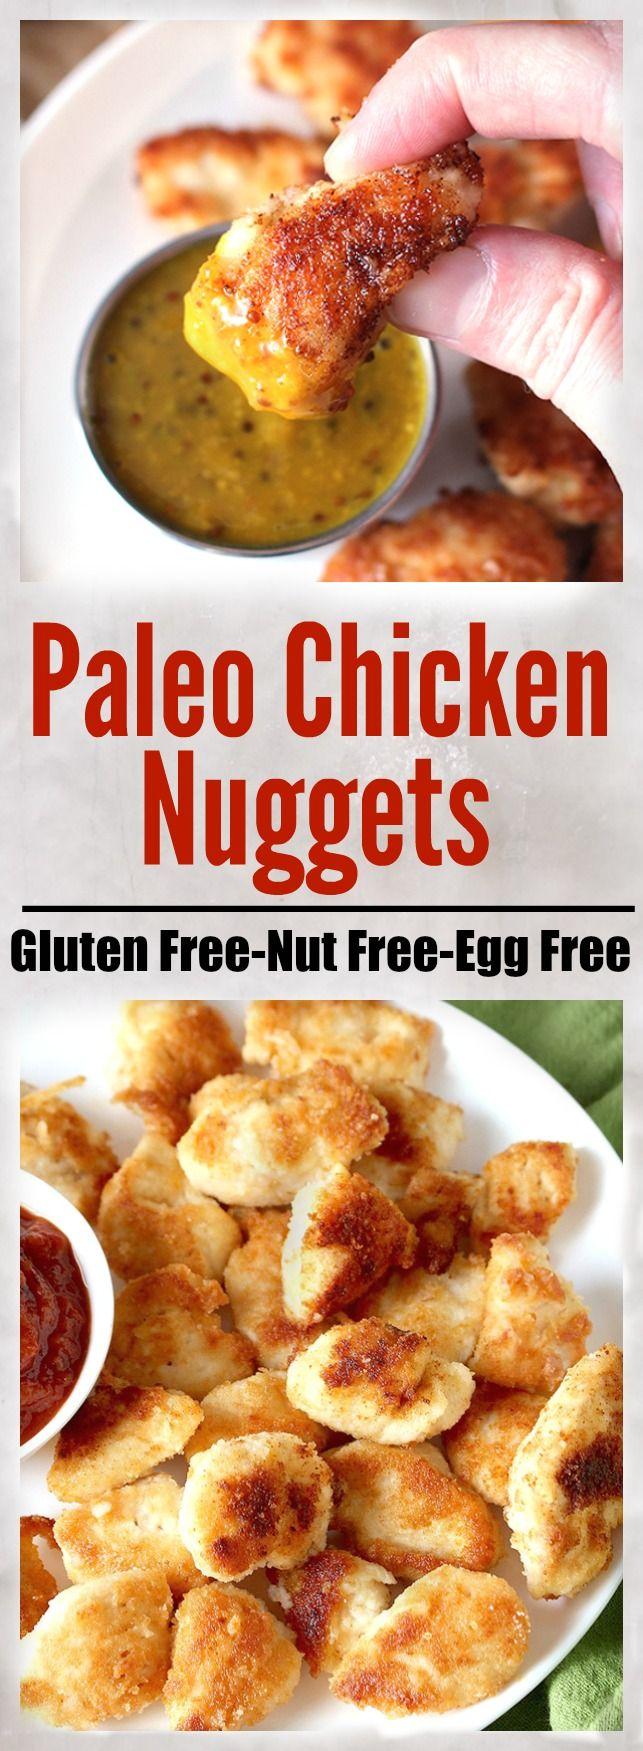 Paleo Chicken Nuggets | Recipe | Eating paleo, Paleo food and Paleo ...